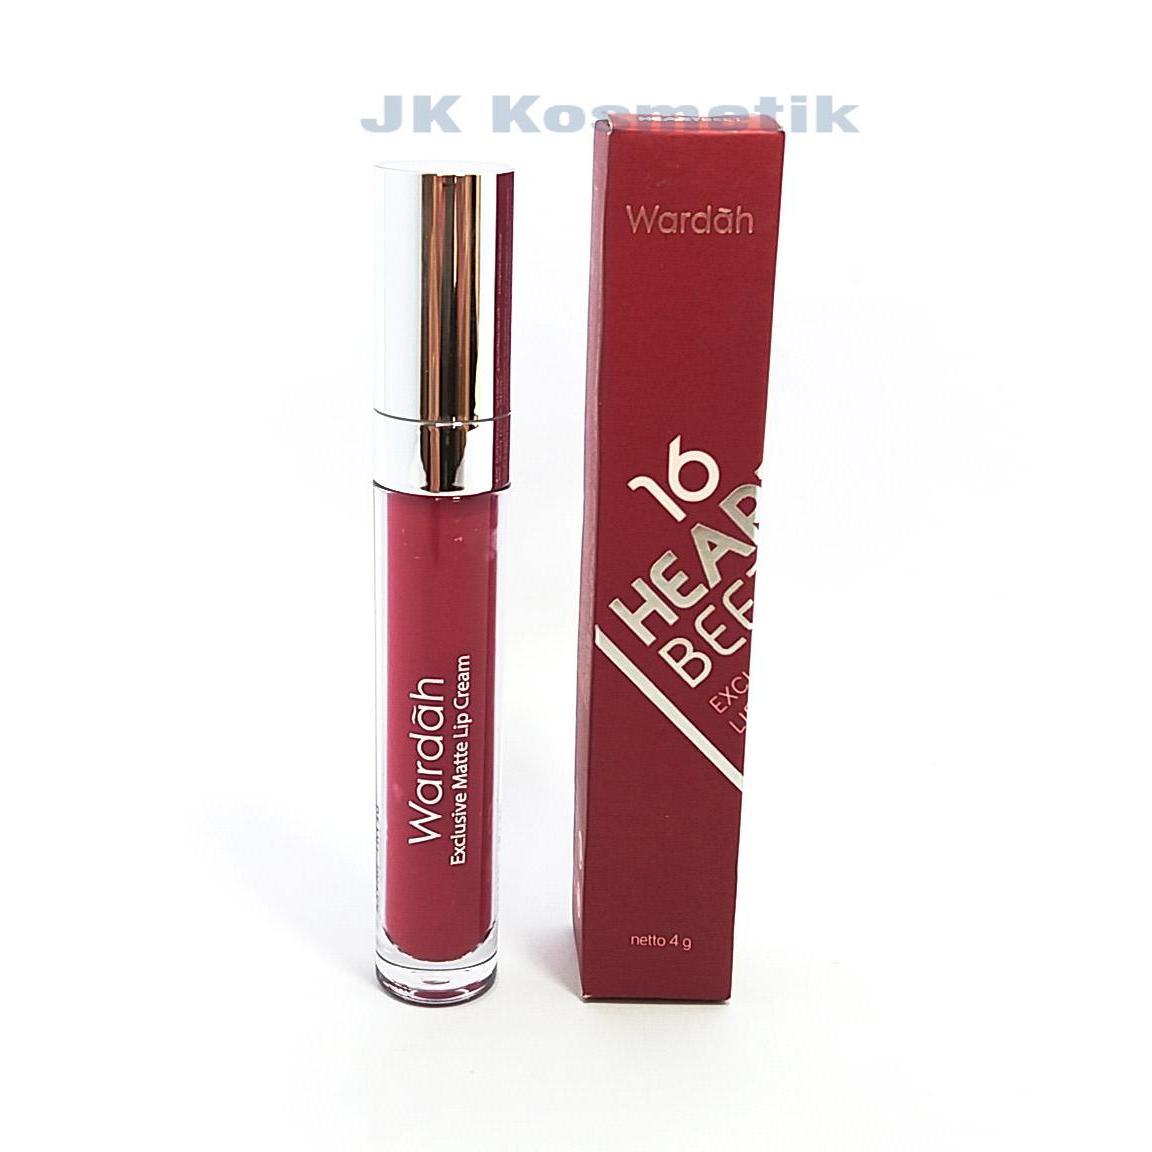 Cek Harga Baru Wardah Exclusive Lip Cream Matte No 16 Heartbeet Lipstick Creamy